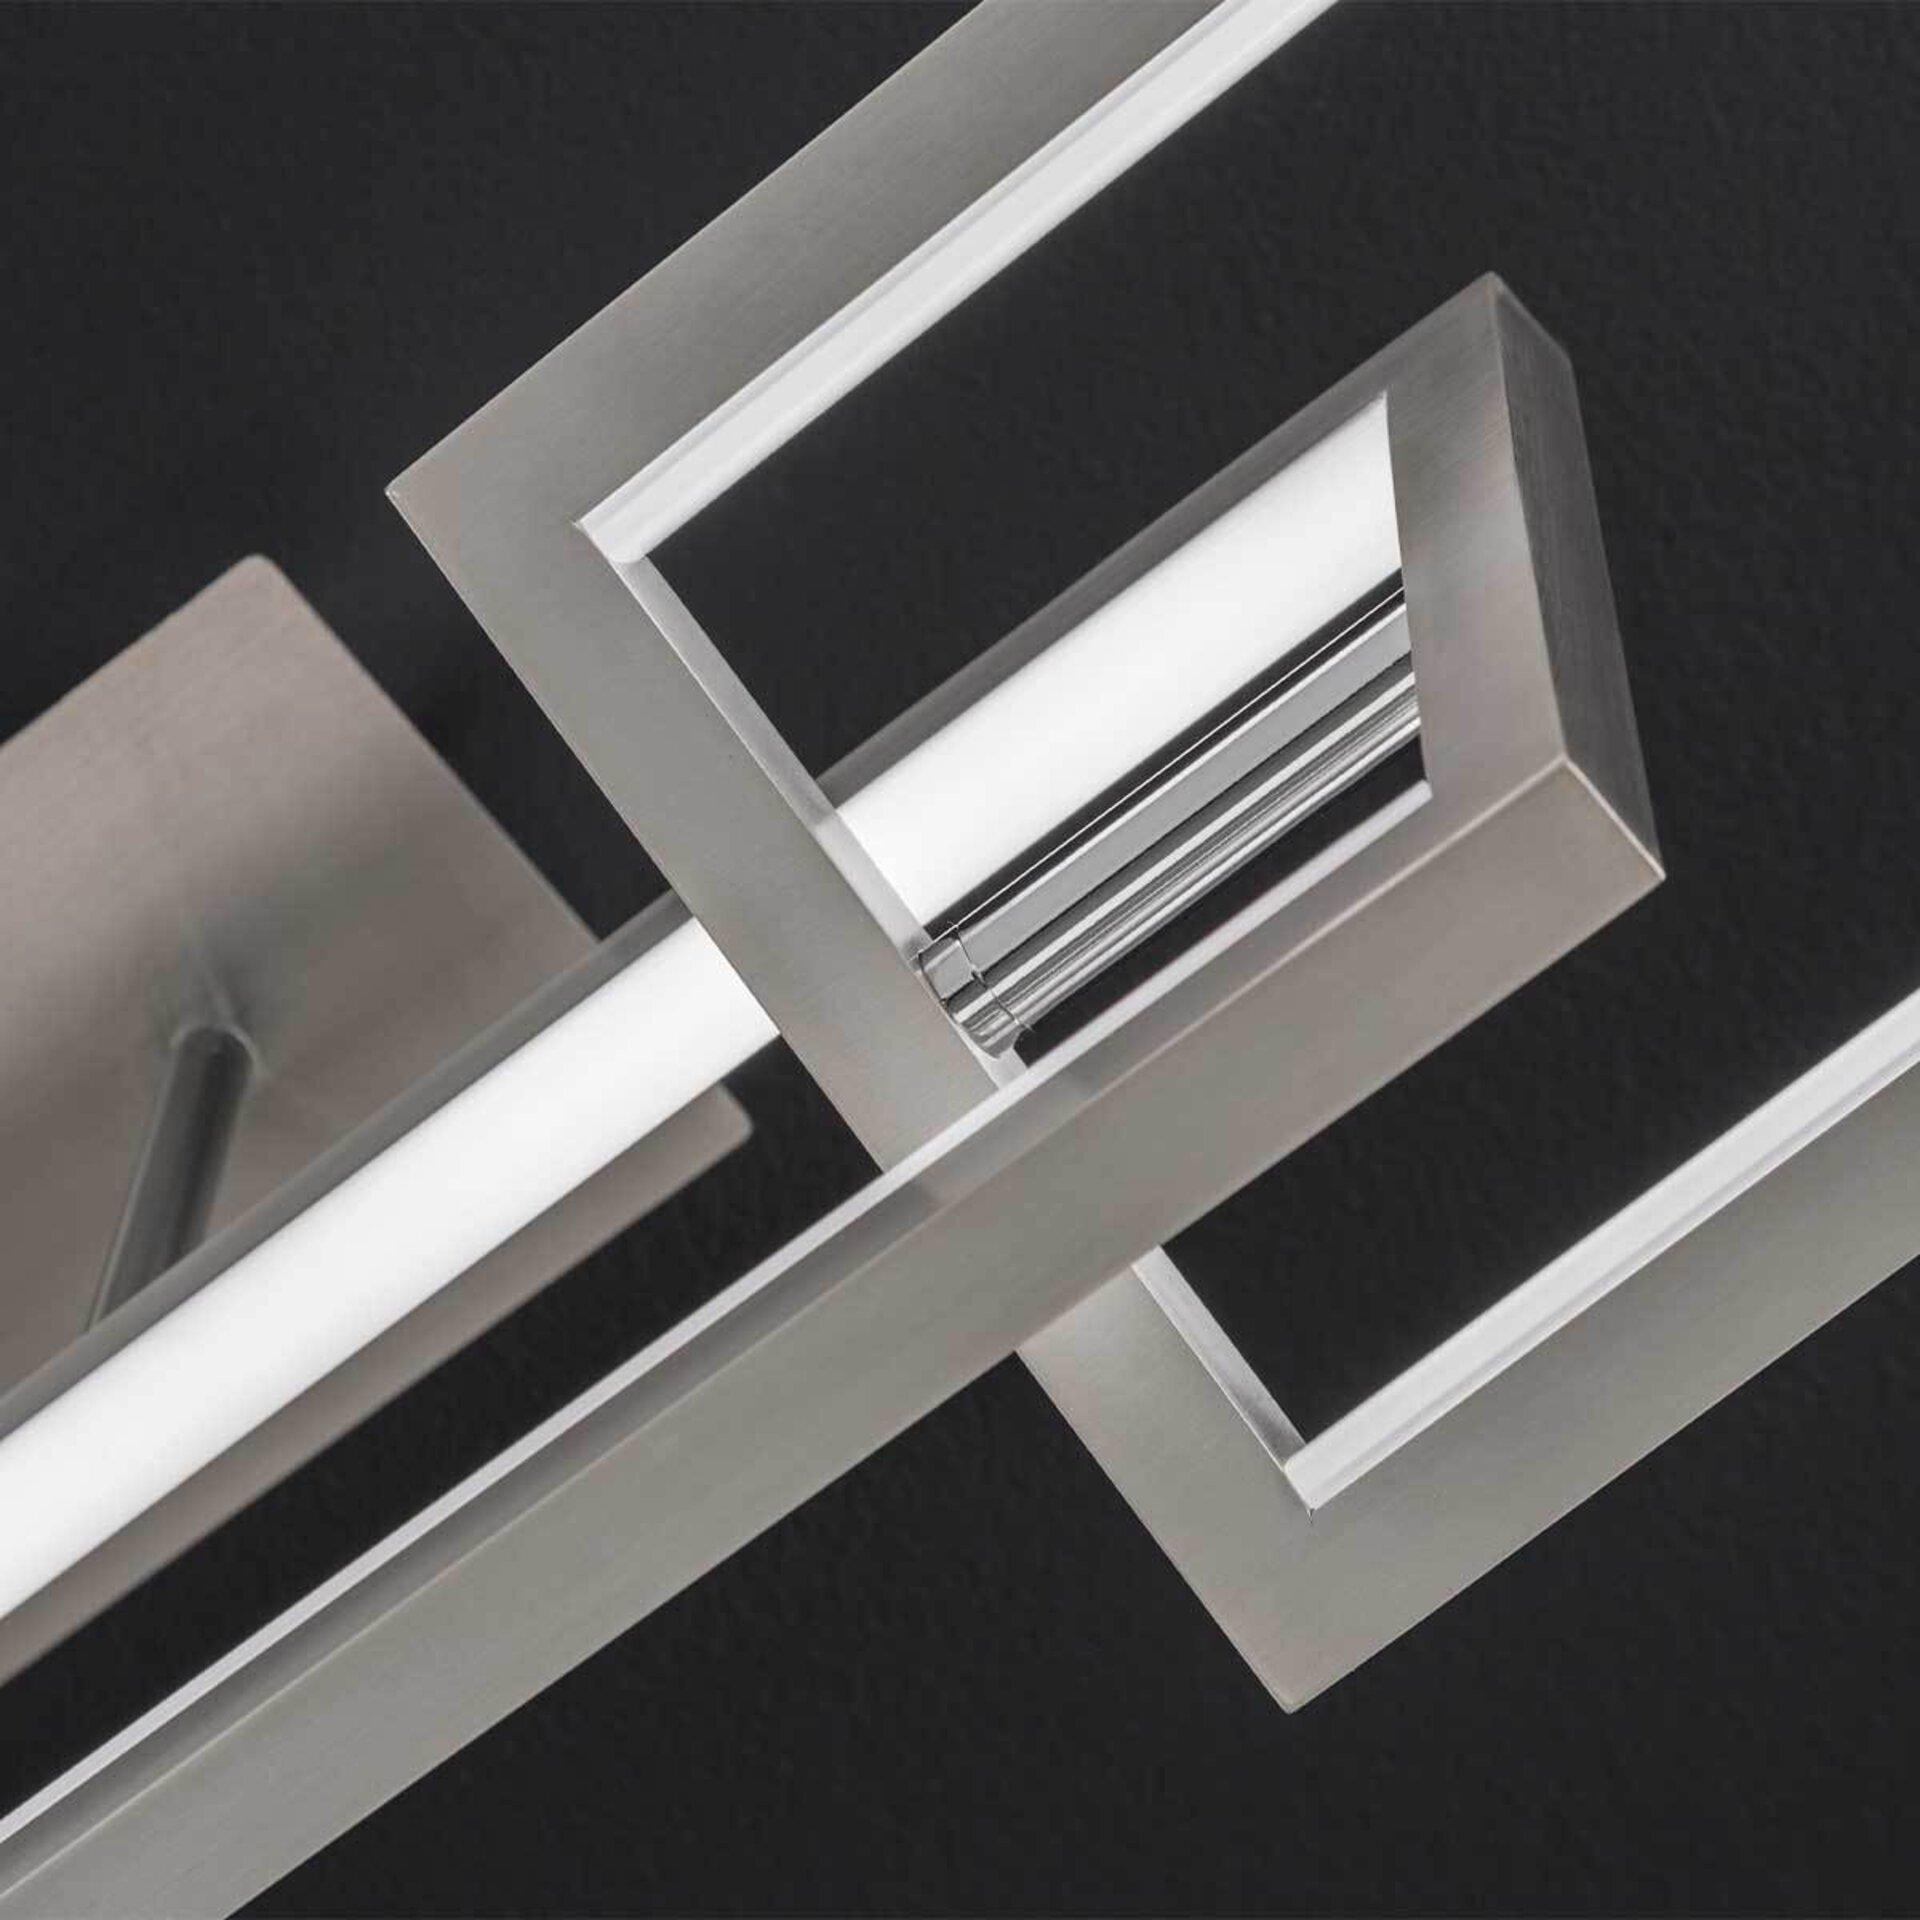 Deckenleuchte Muriel Wofi Leuchten Metall silber 30 x 31 x 100 cm